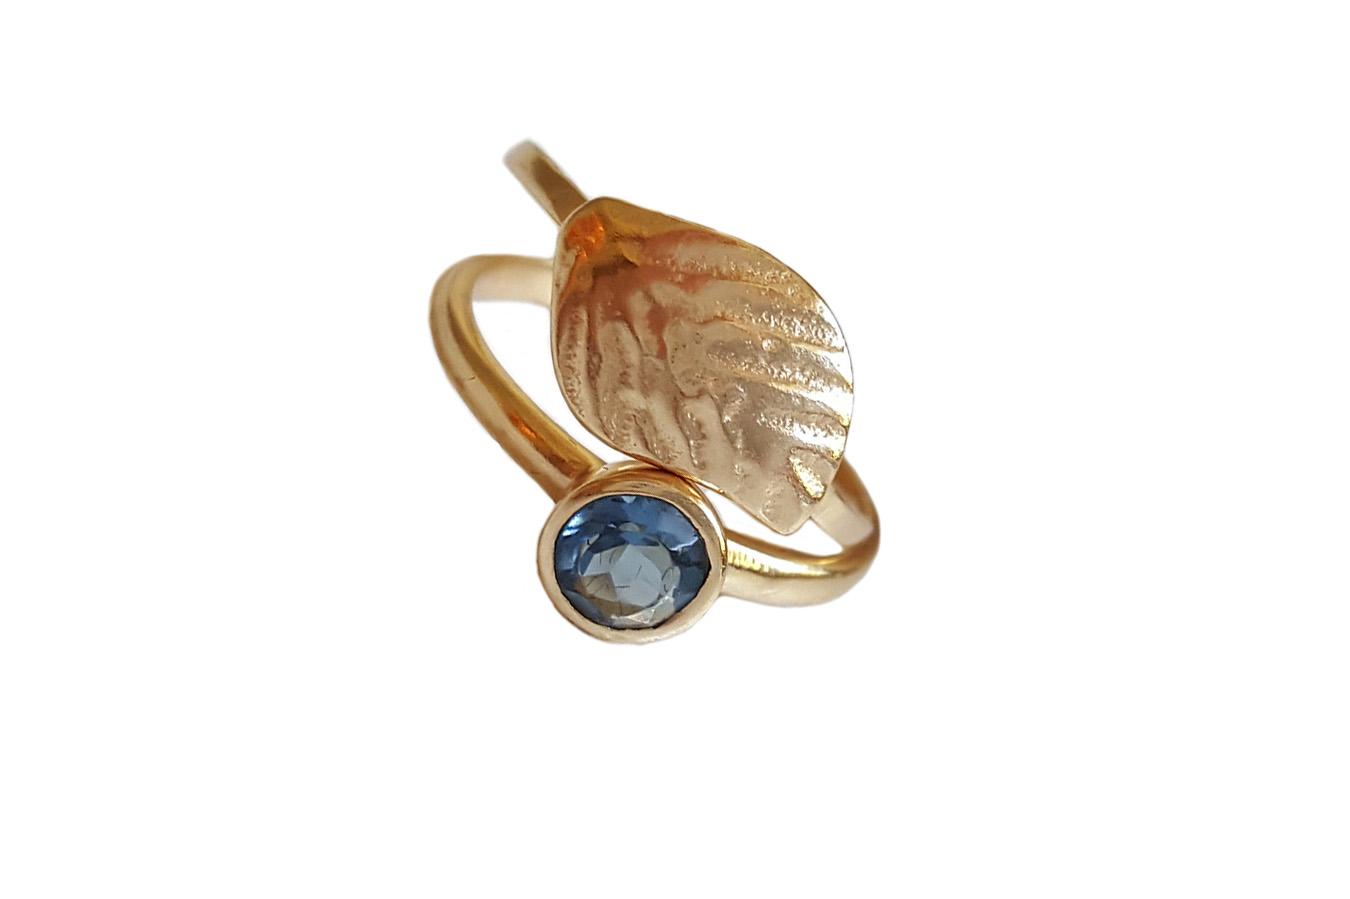 inel placat cu aur si iolit albastru